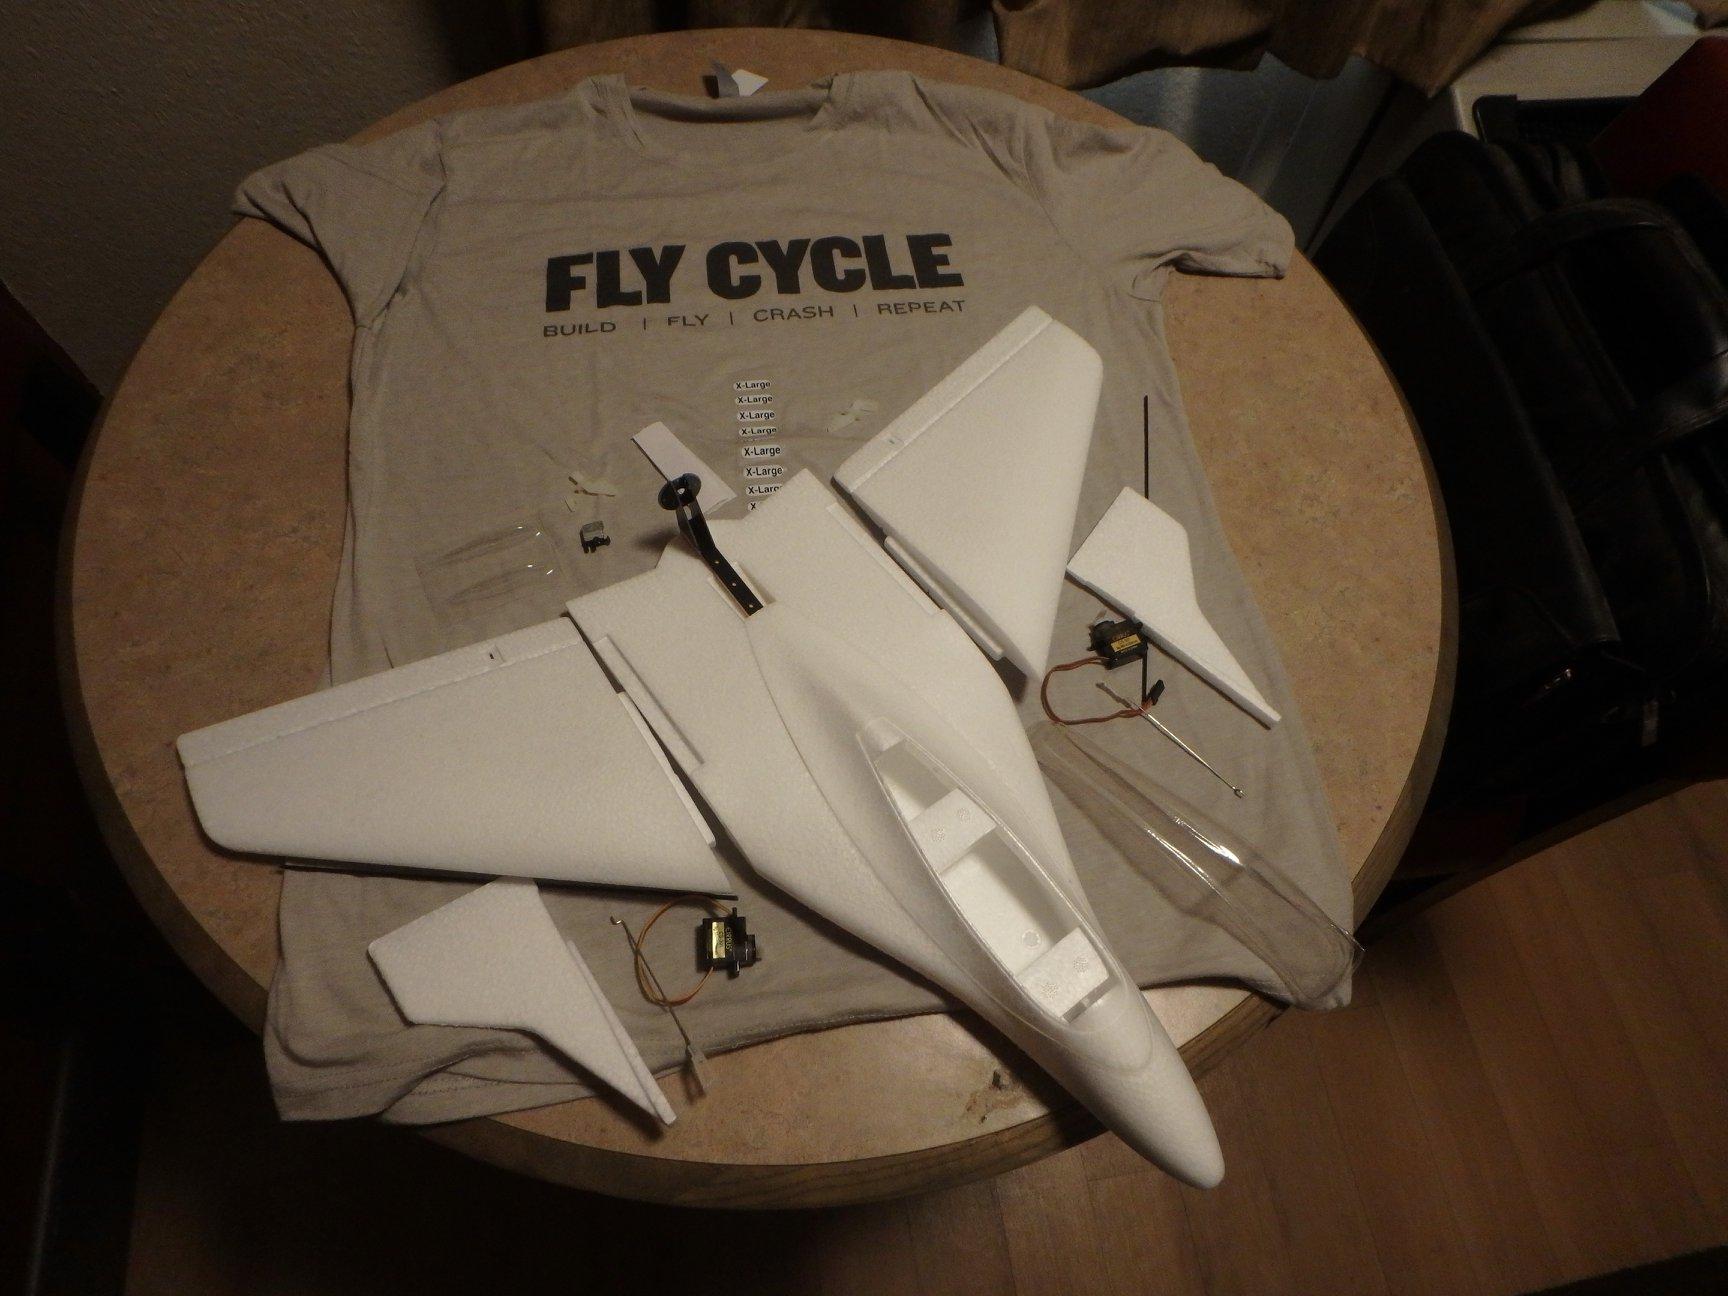 mysteryplane.jpg